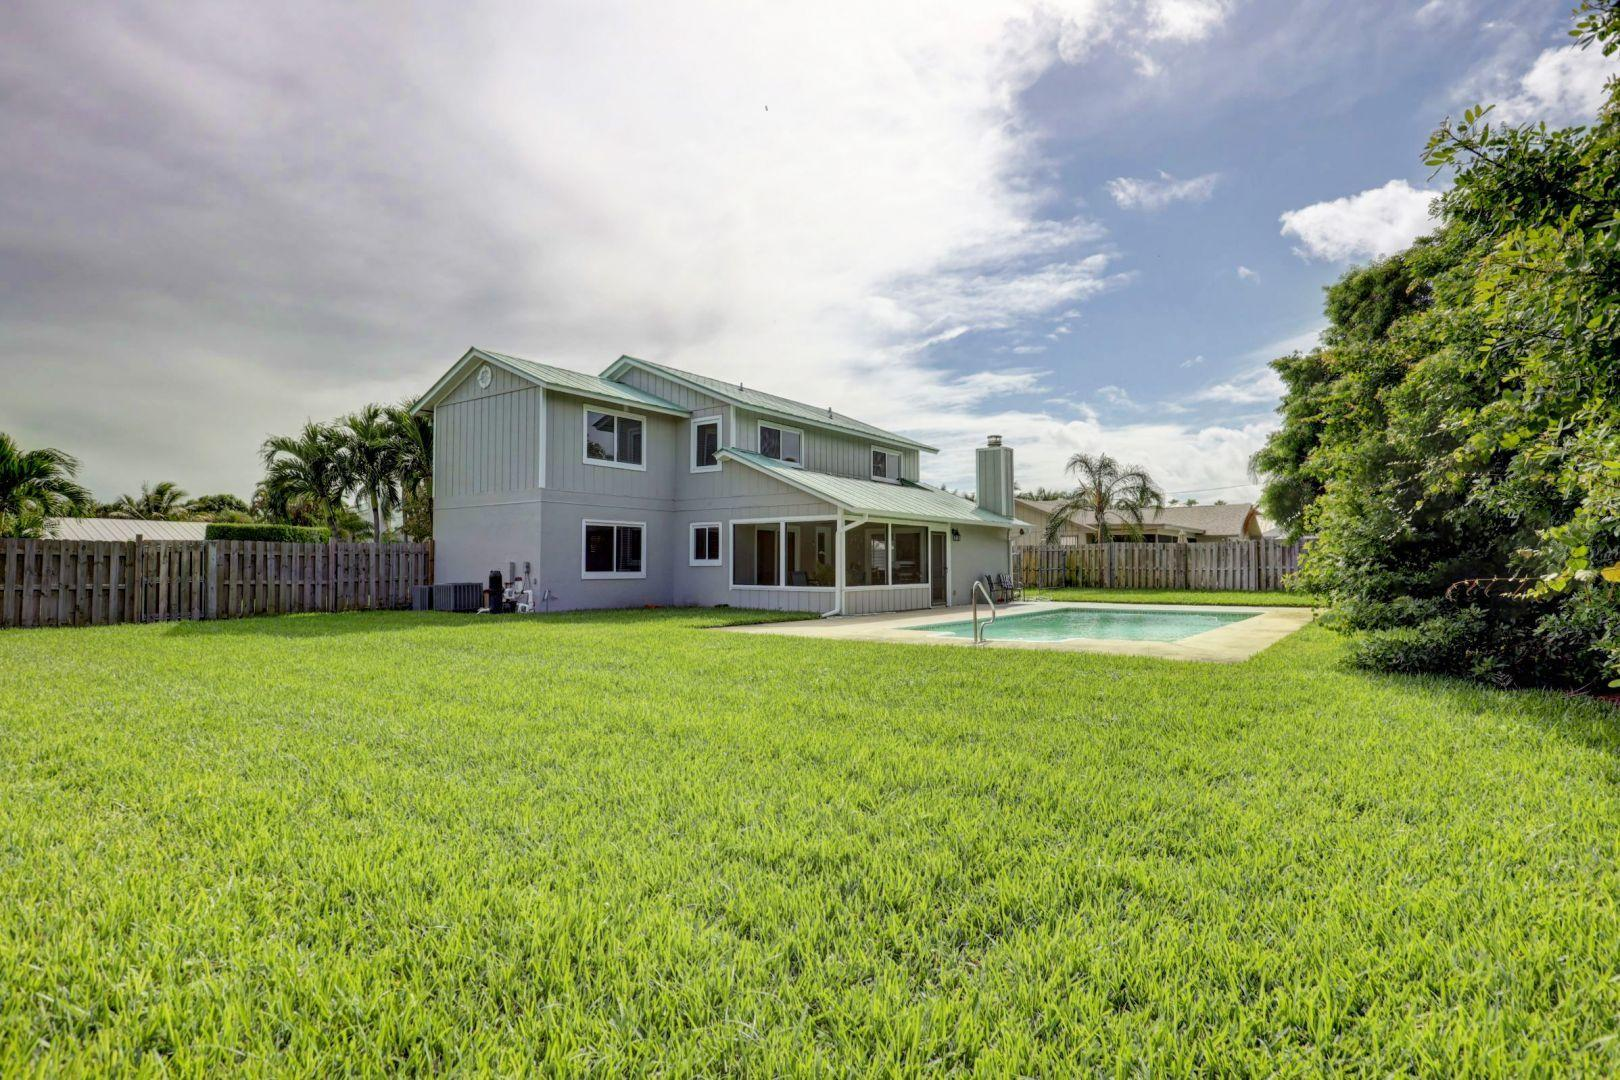 Photo of 8121 SE Shiloh Terrace, Hobe Sound, FL 33455